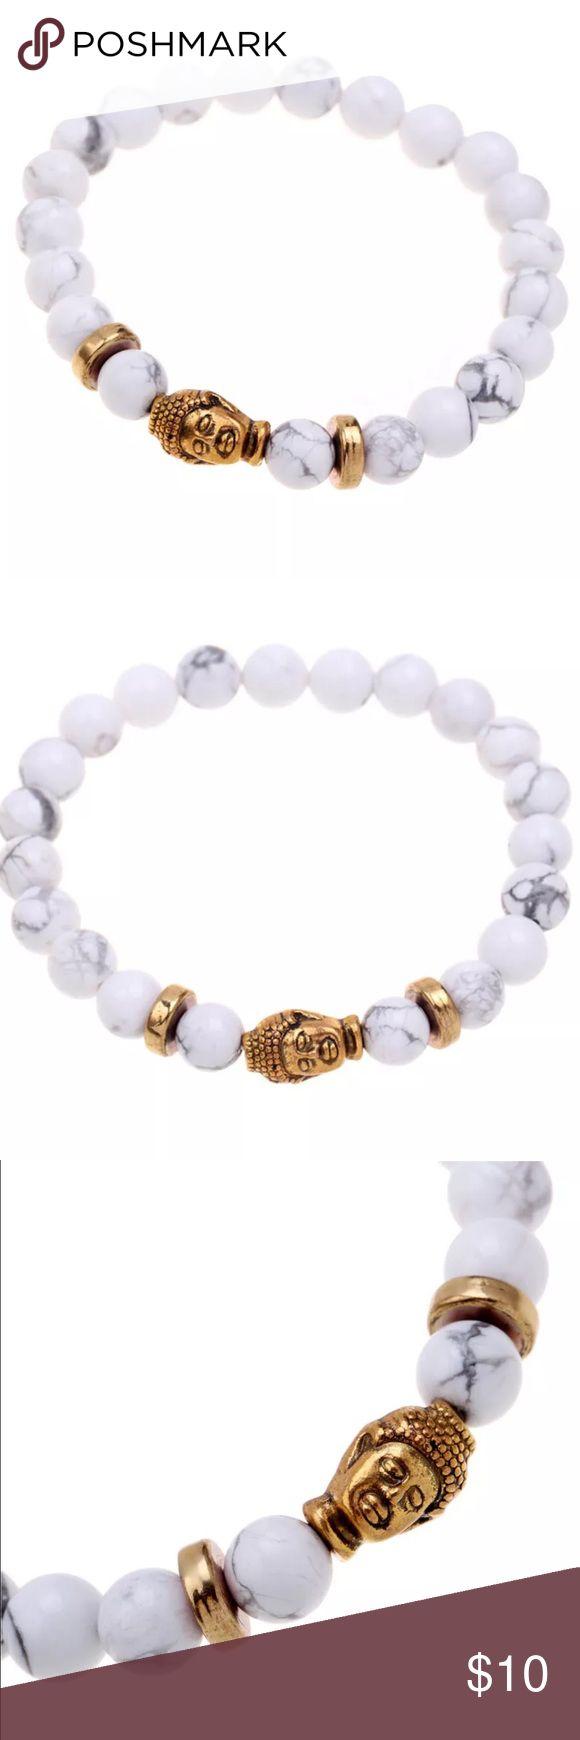 WHITE MARBLE BEADED BUDDHA BRACELET Marble beads and gold buddha head. Stretch bracelet one size fits all Jewelry Bracelets